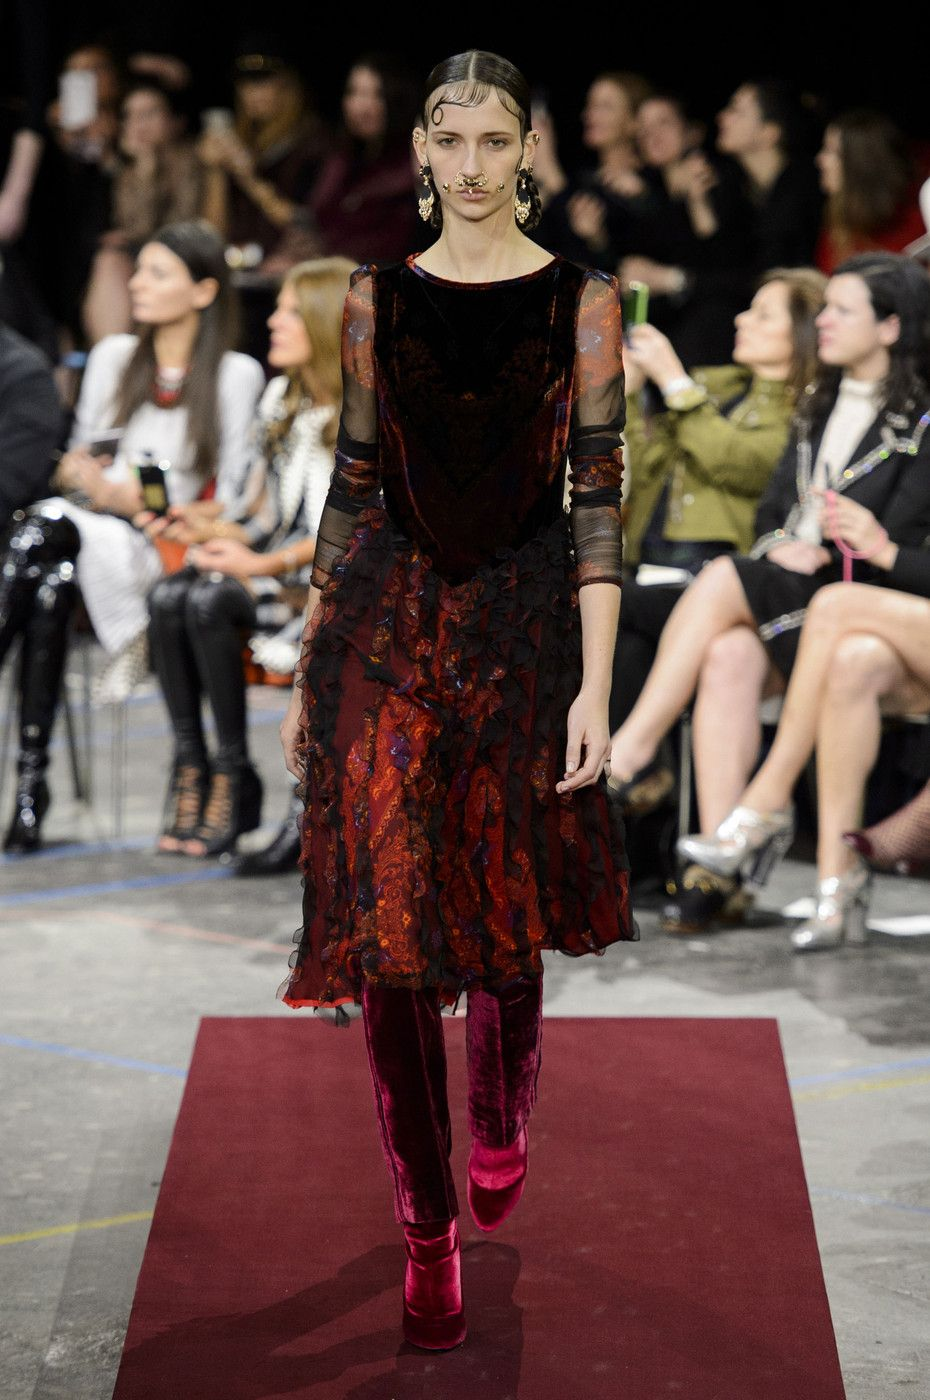 Givenchy - Fall 2015 Ready-to-Wear by Riccardo Tisci